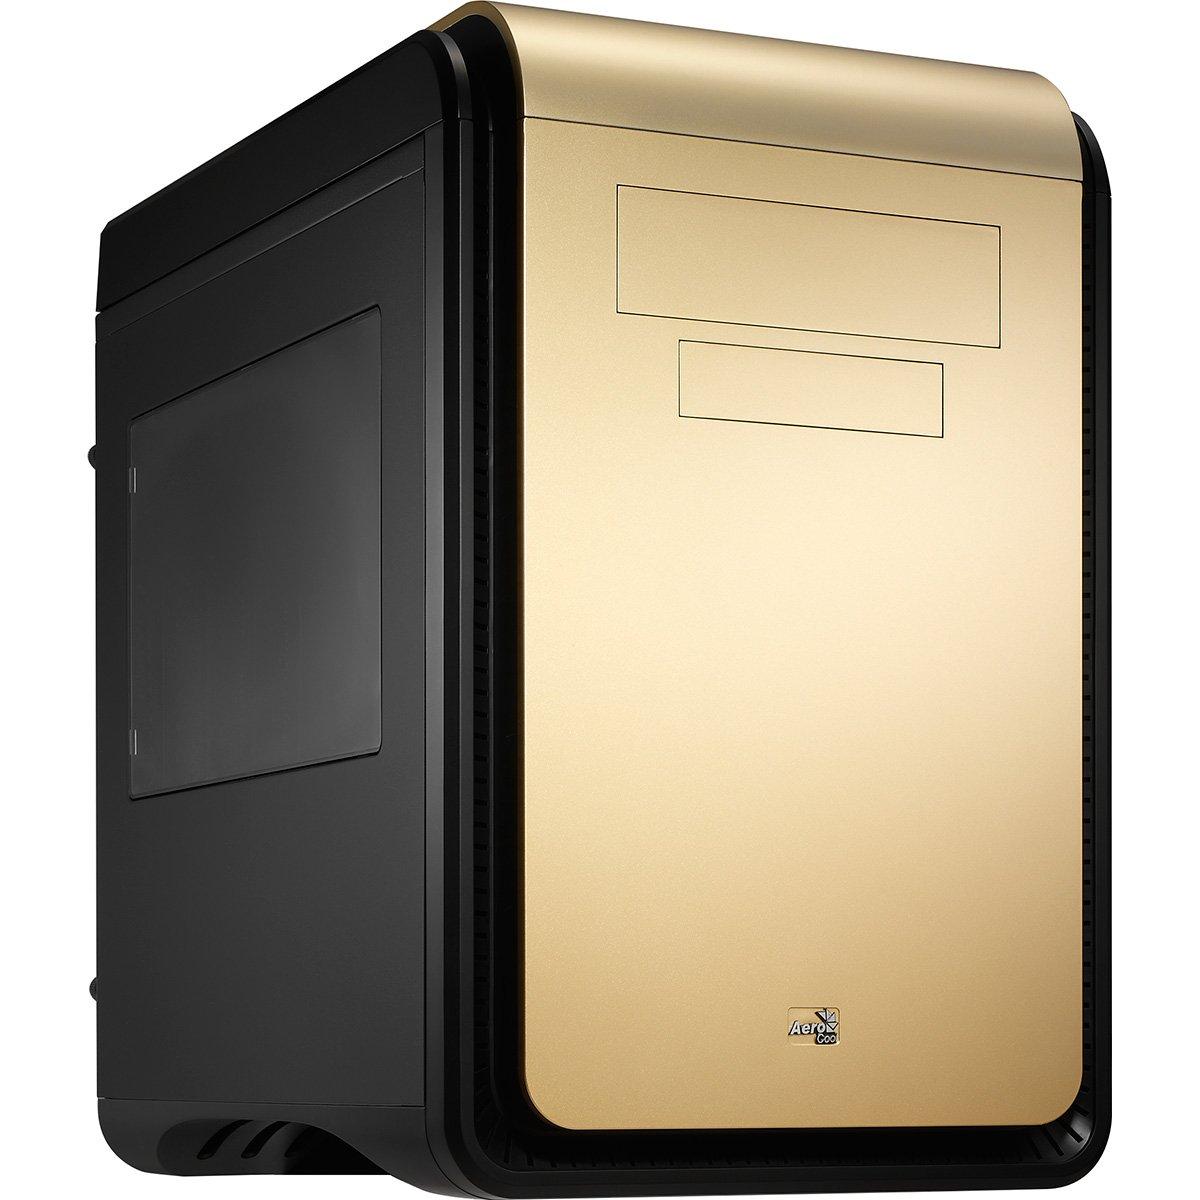 Cubo, PC, SGCC, Fondo, 1x 200 mm, 120, 140, 200 mm Negro Caja de Ordenador Oro Aerocool DS Cube